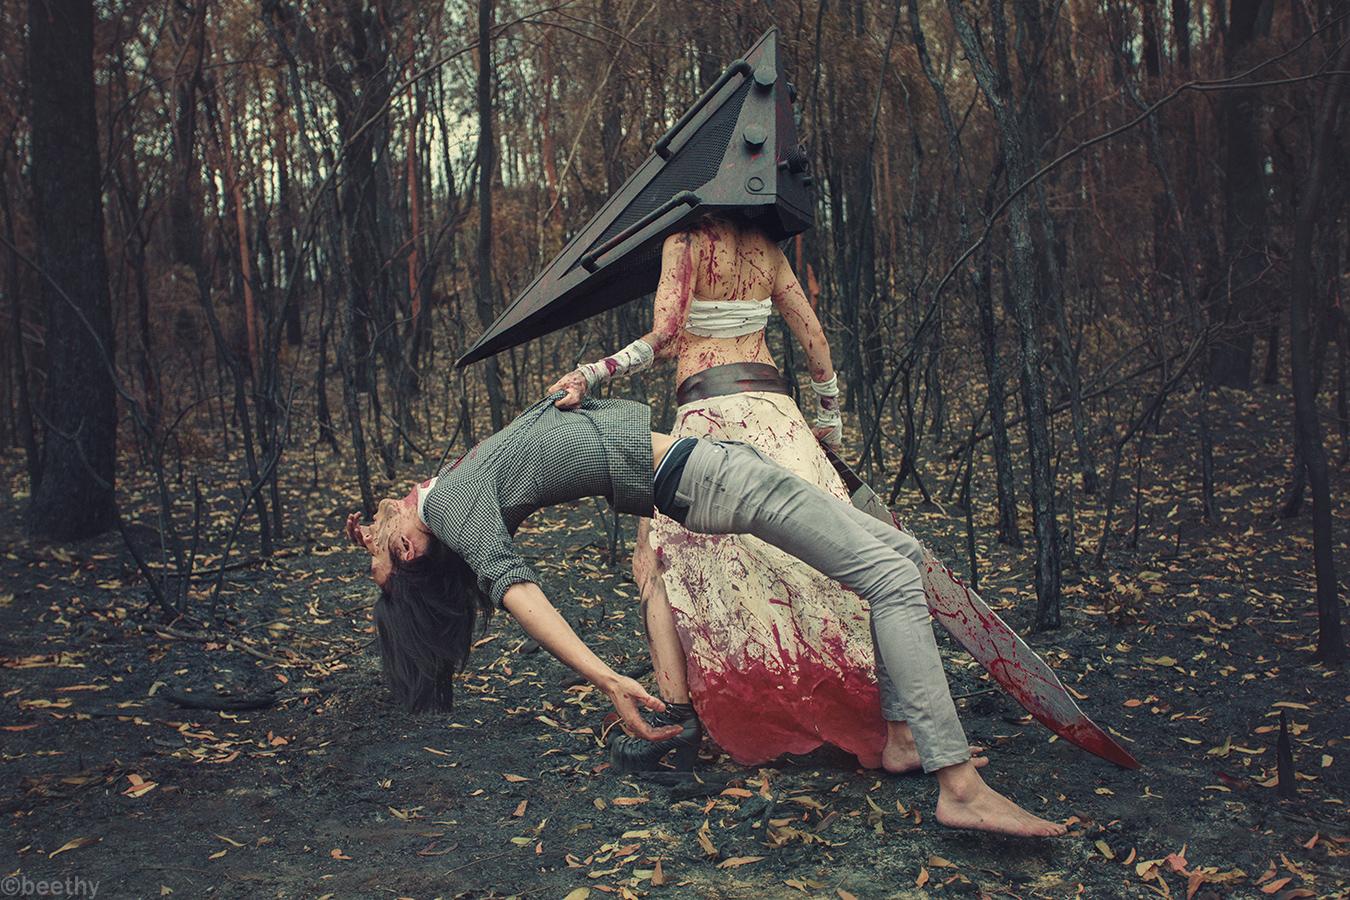 Silent Hill Pyramid Head 02 By Beethy On Deviantart